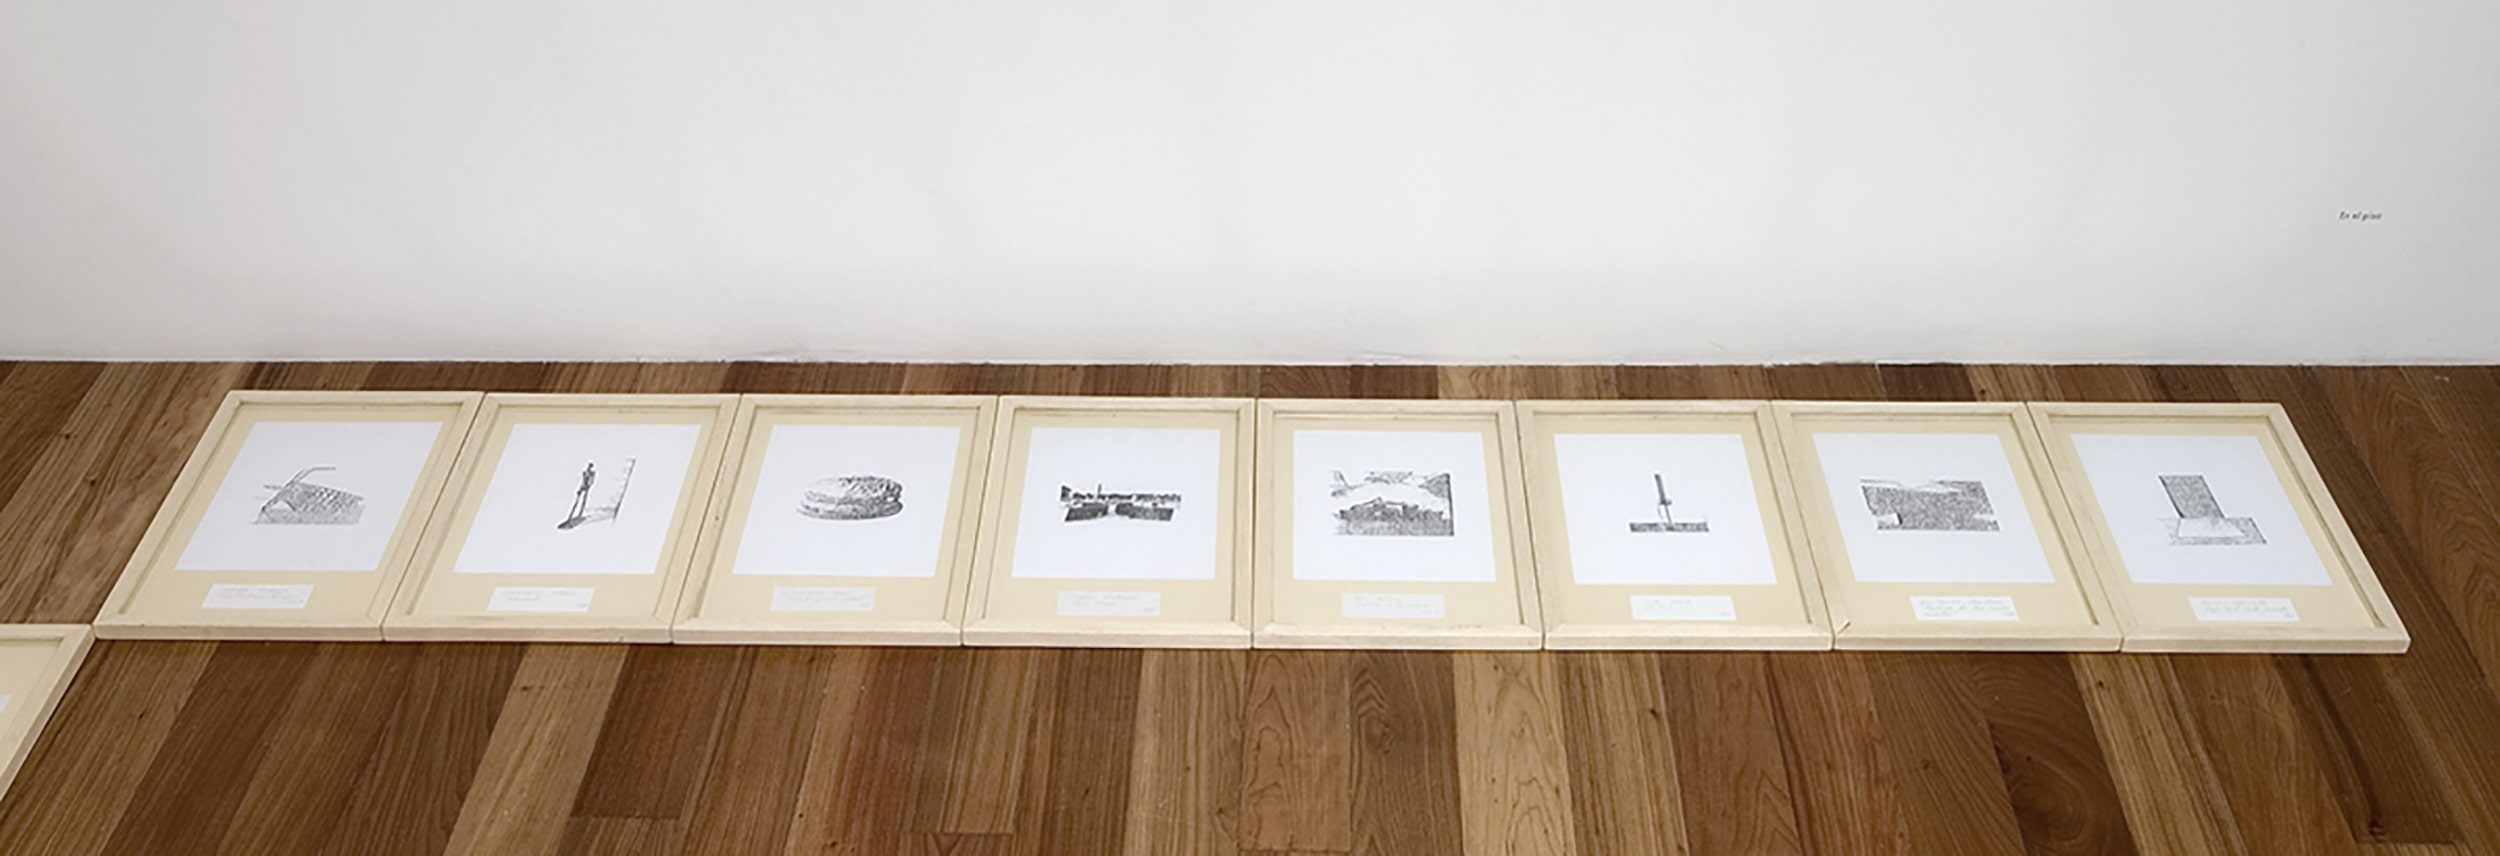 1000 drawings nueveochenta esteban peña art